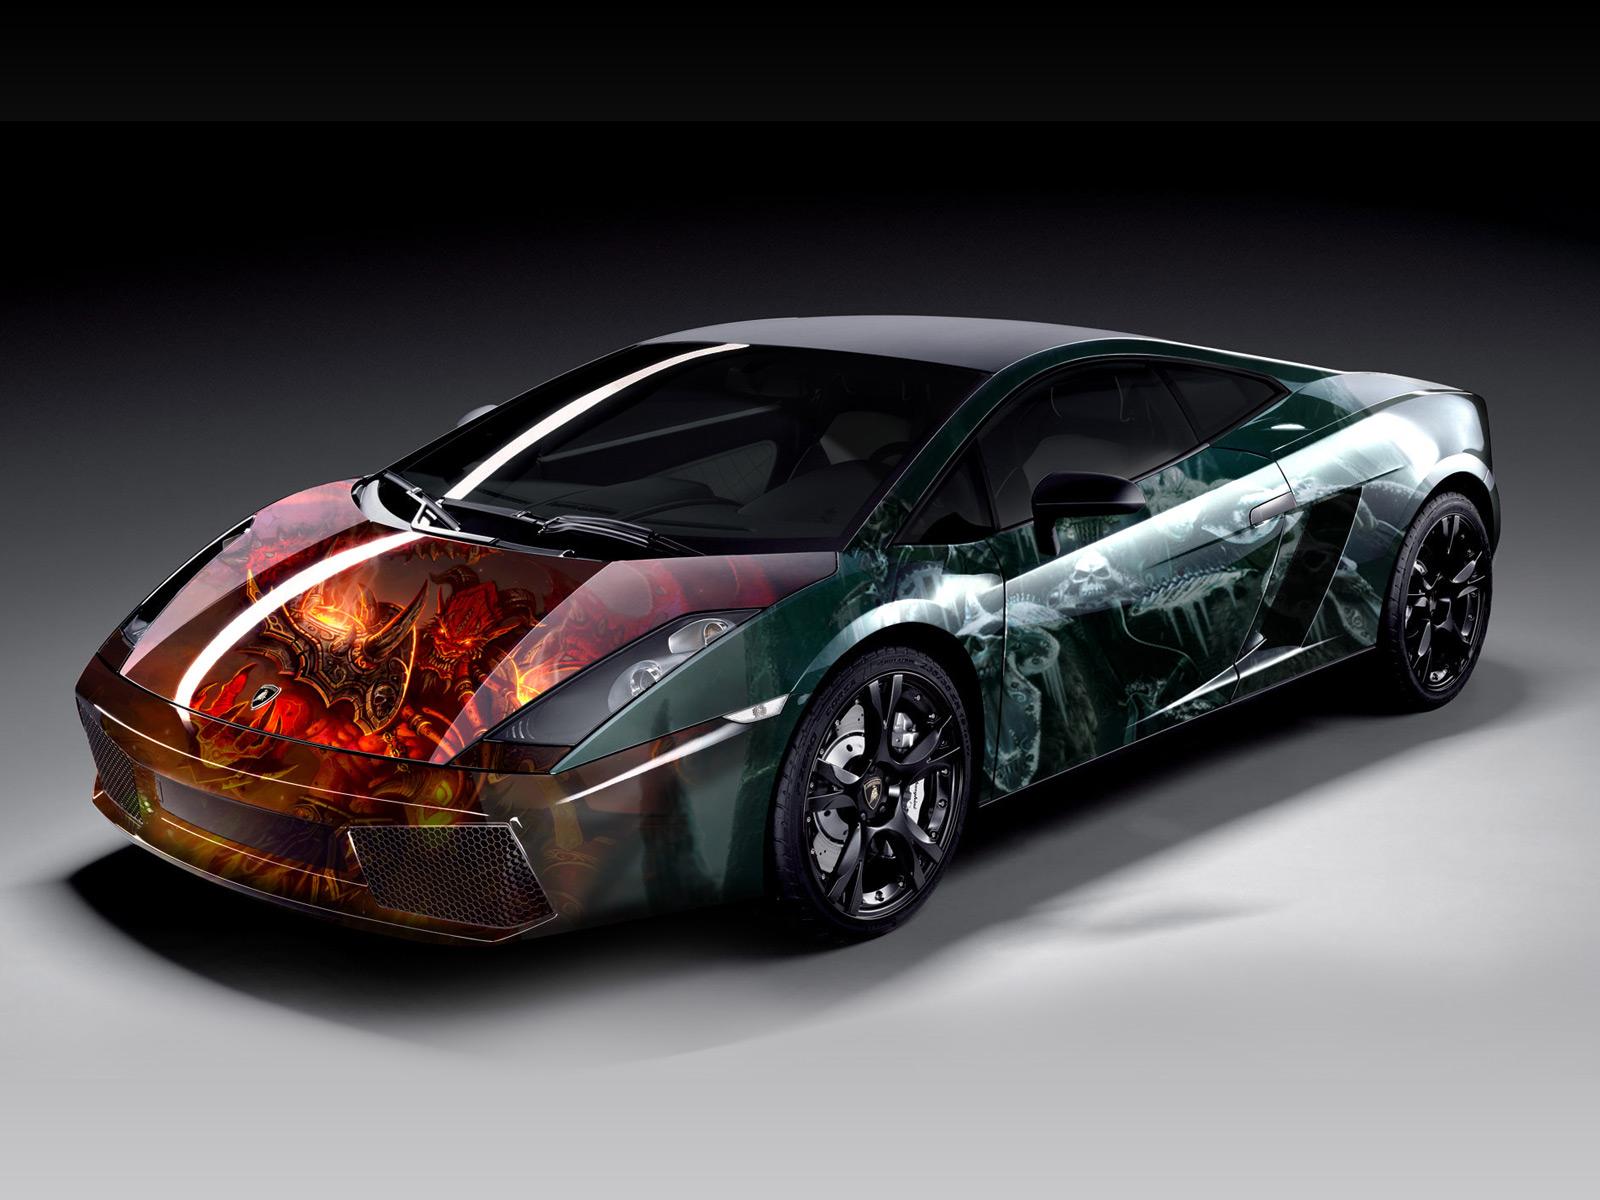 amazing cars hd %2b100%2b9